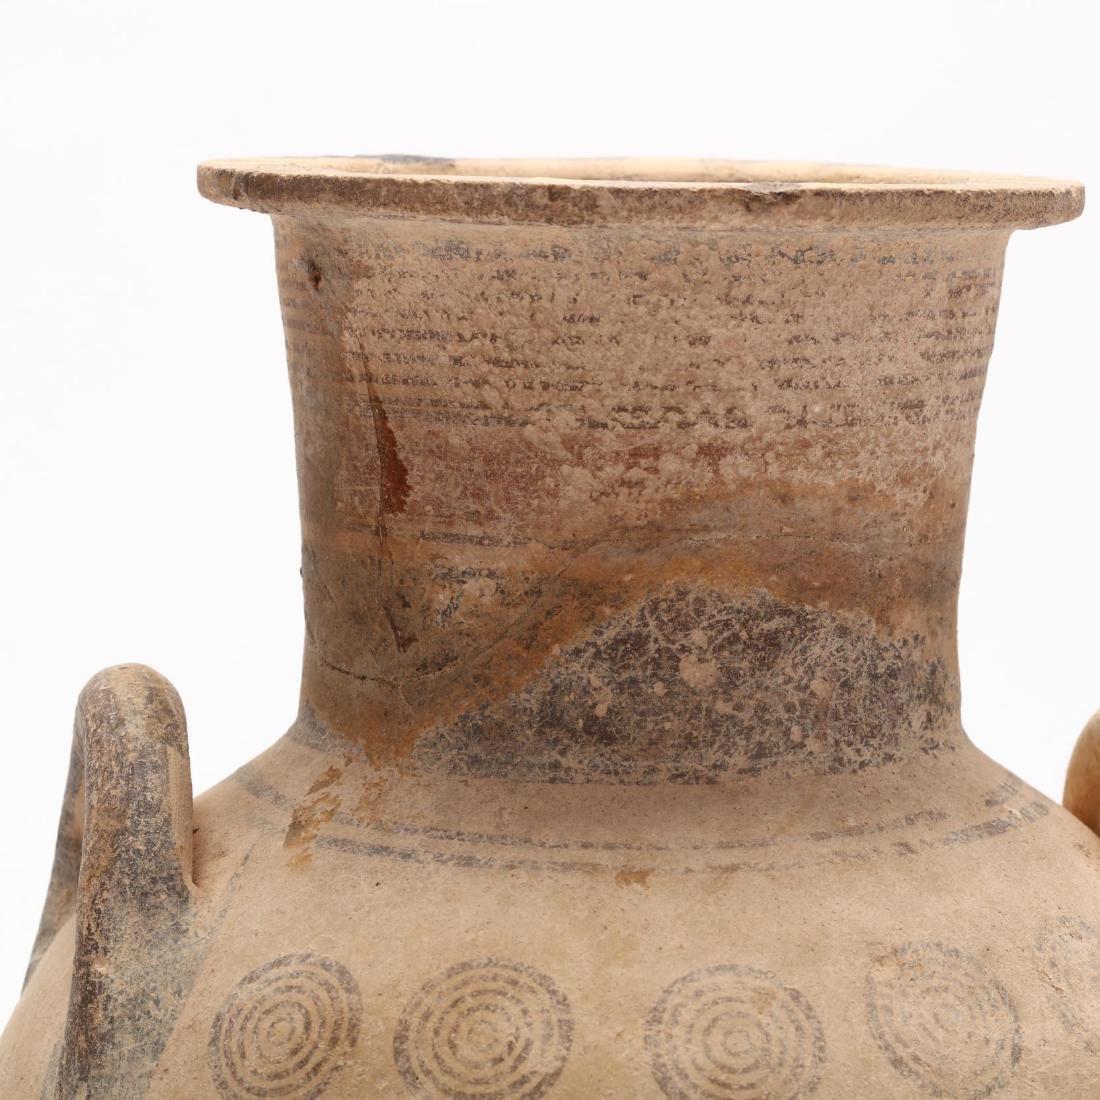 Cypro-Geometric Footed Amphora - 7